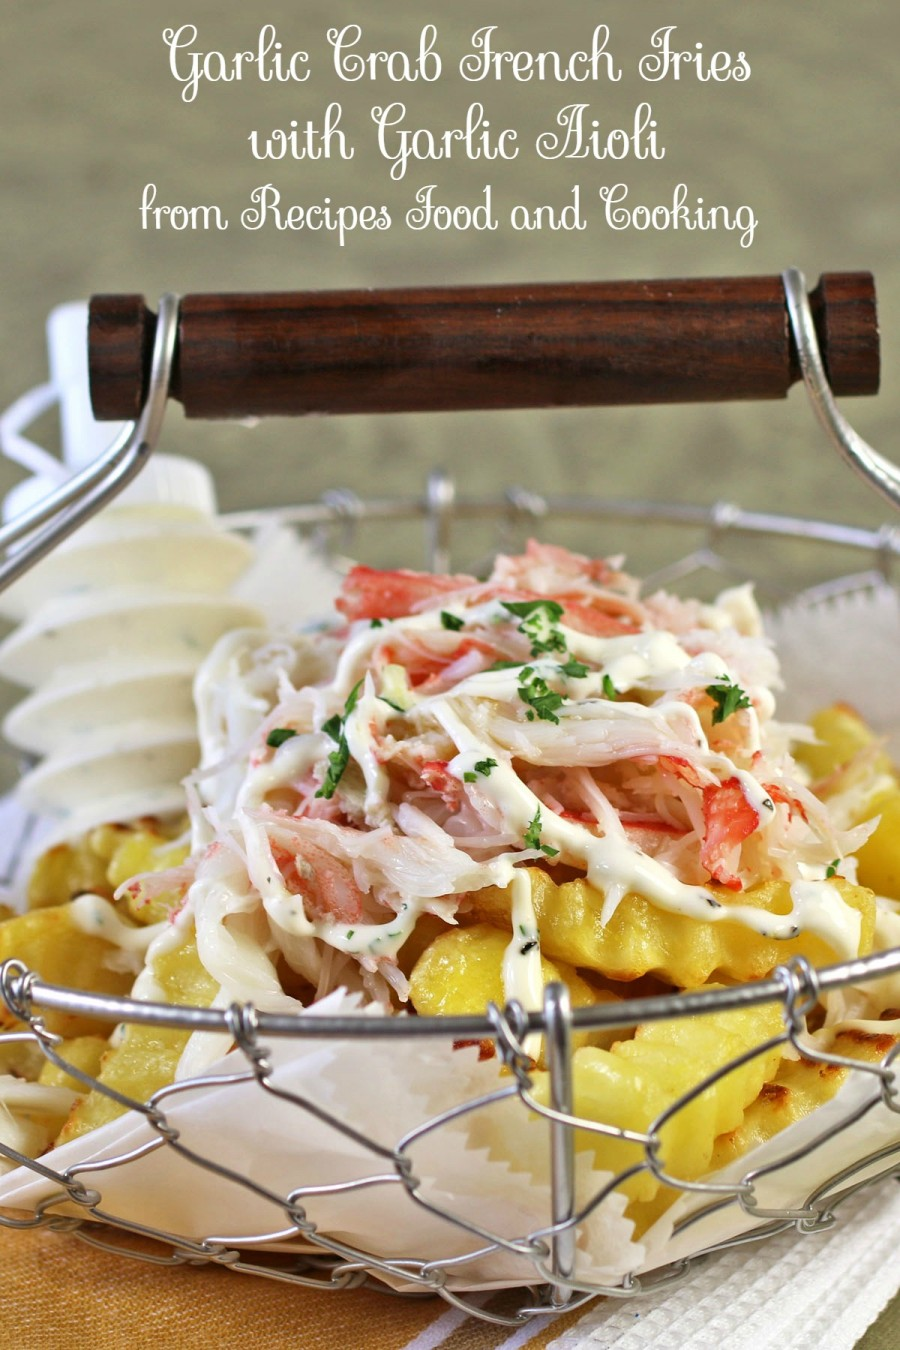 crab-fries-11pf